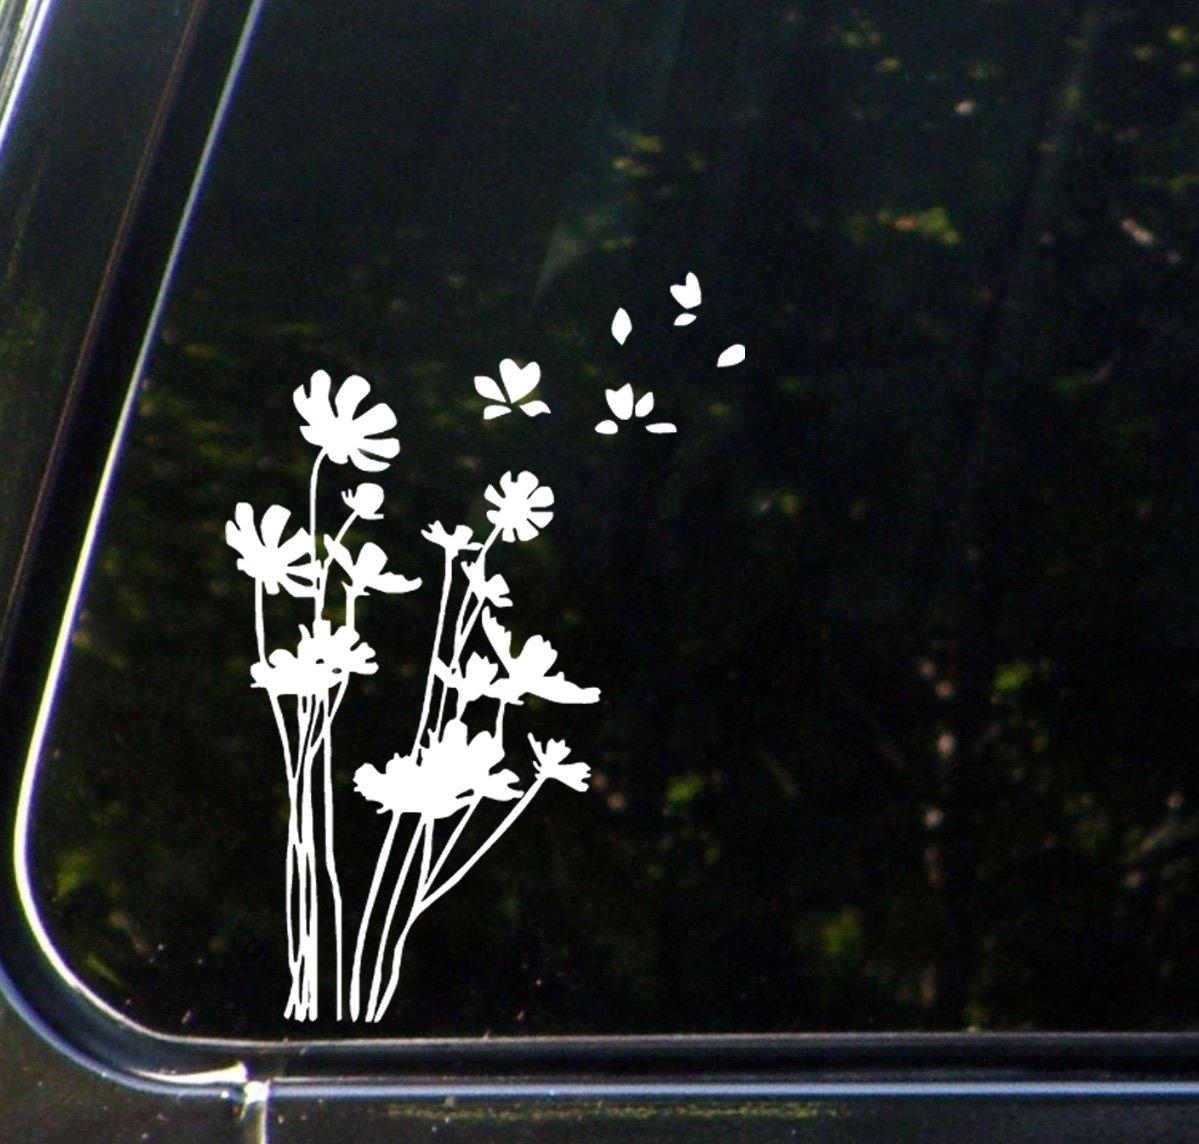 Amazon Flowers In The Wind Car Vinyl Decal Sticker 55w X